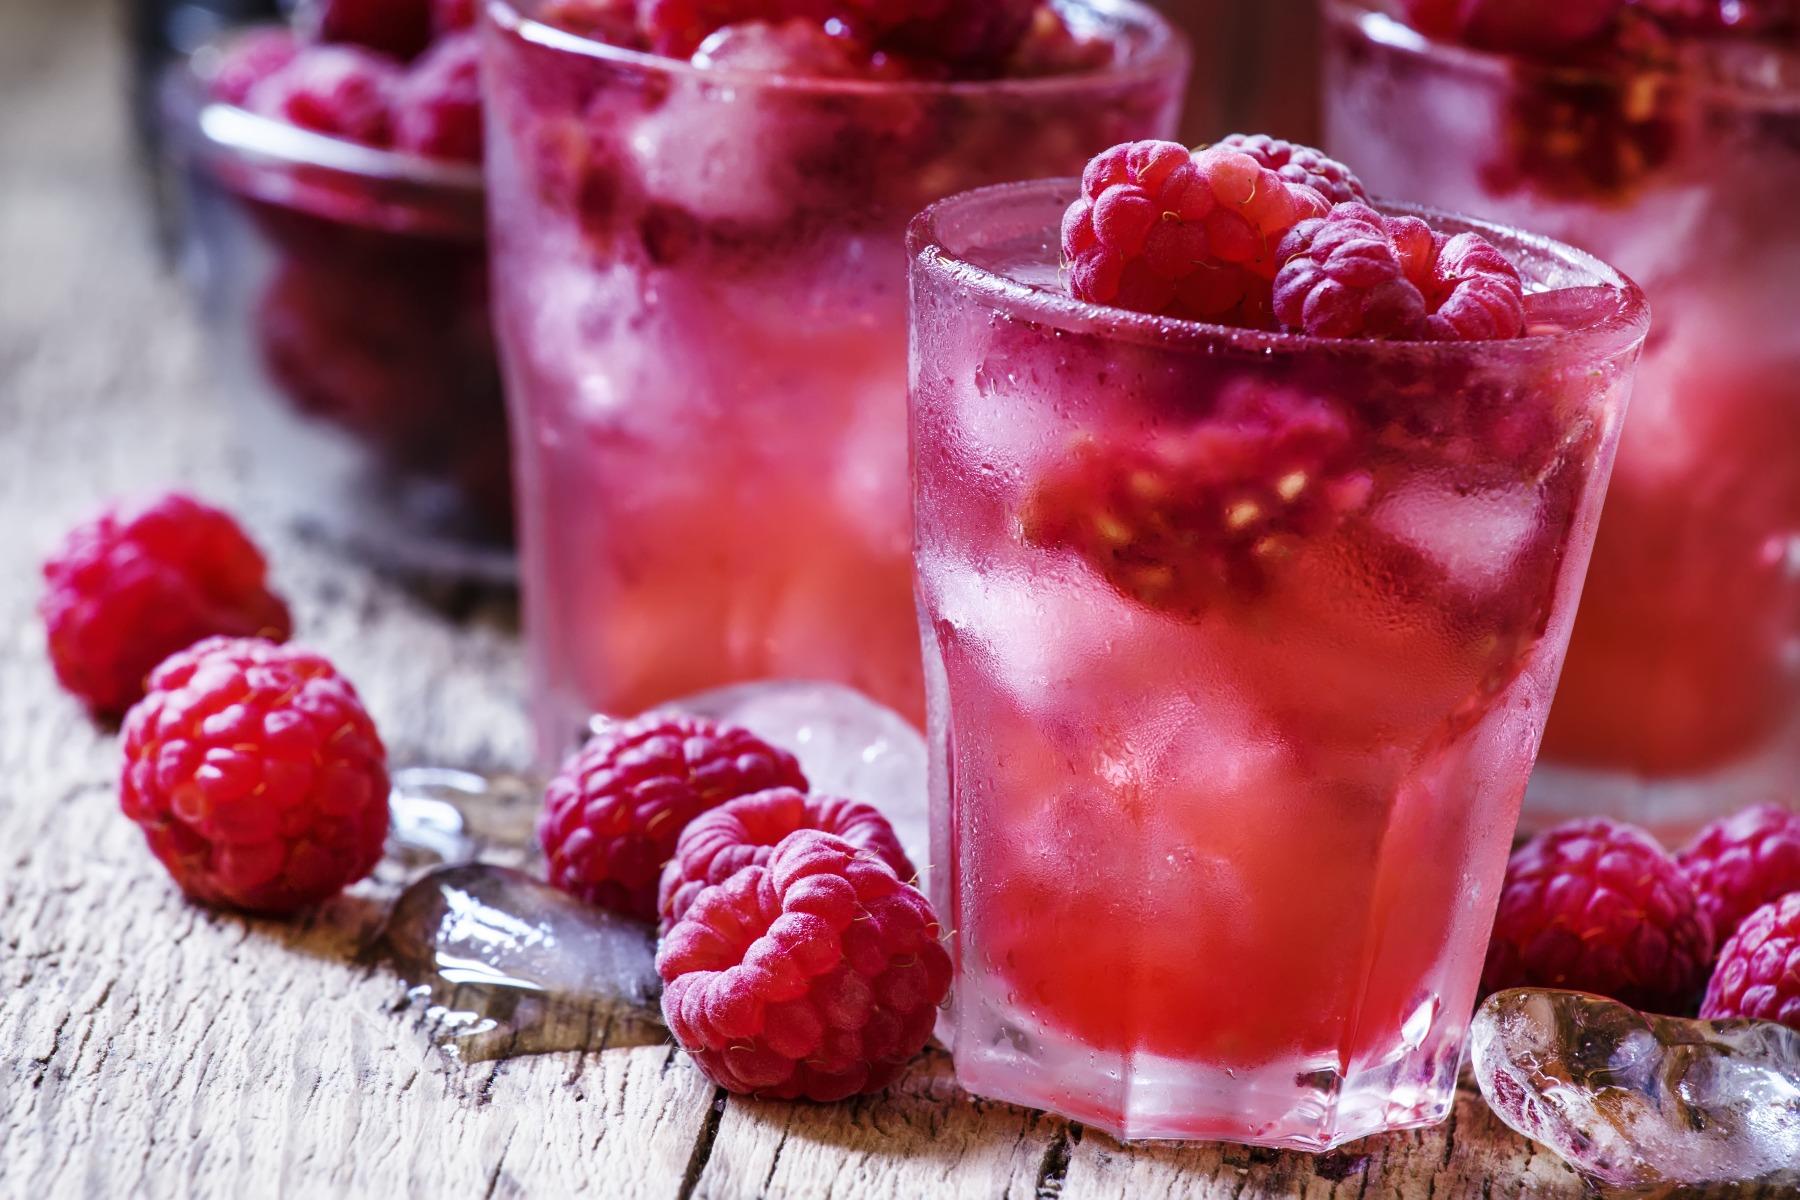 PrikenTik - Bartender - Raspberry Caipirinha